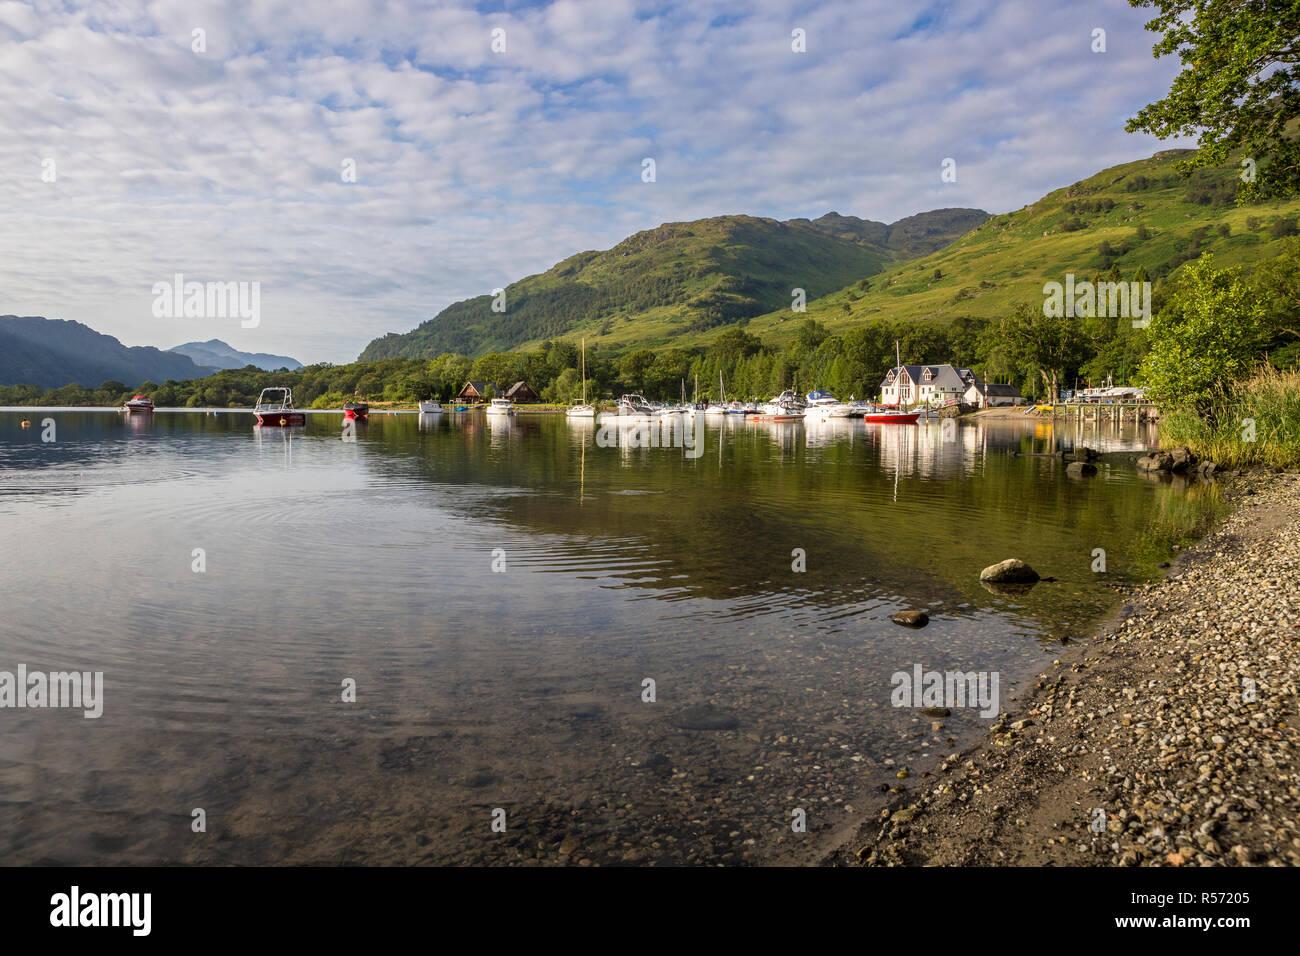 Waterfront at Loch Lomond Holiday Park on a calm sunny summer morning, Inveruglas, Loch Lomond & The Trossachs National Park, Scotland, UK - Stock Image